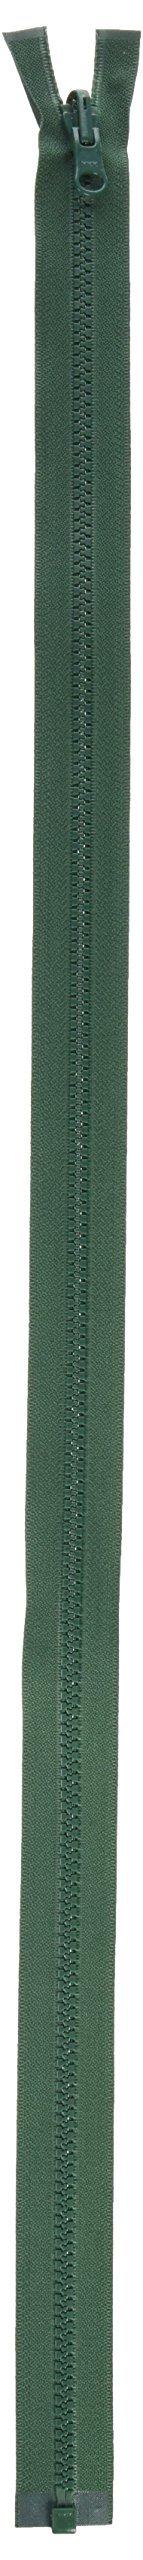 American & Efird Vislon Reversible Separating Zipper: 30'' Dark Green by American & Efird